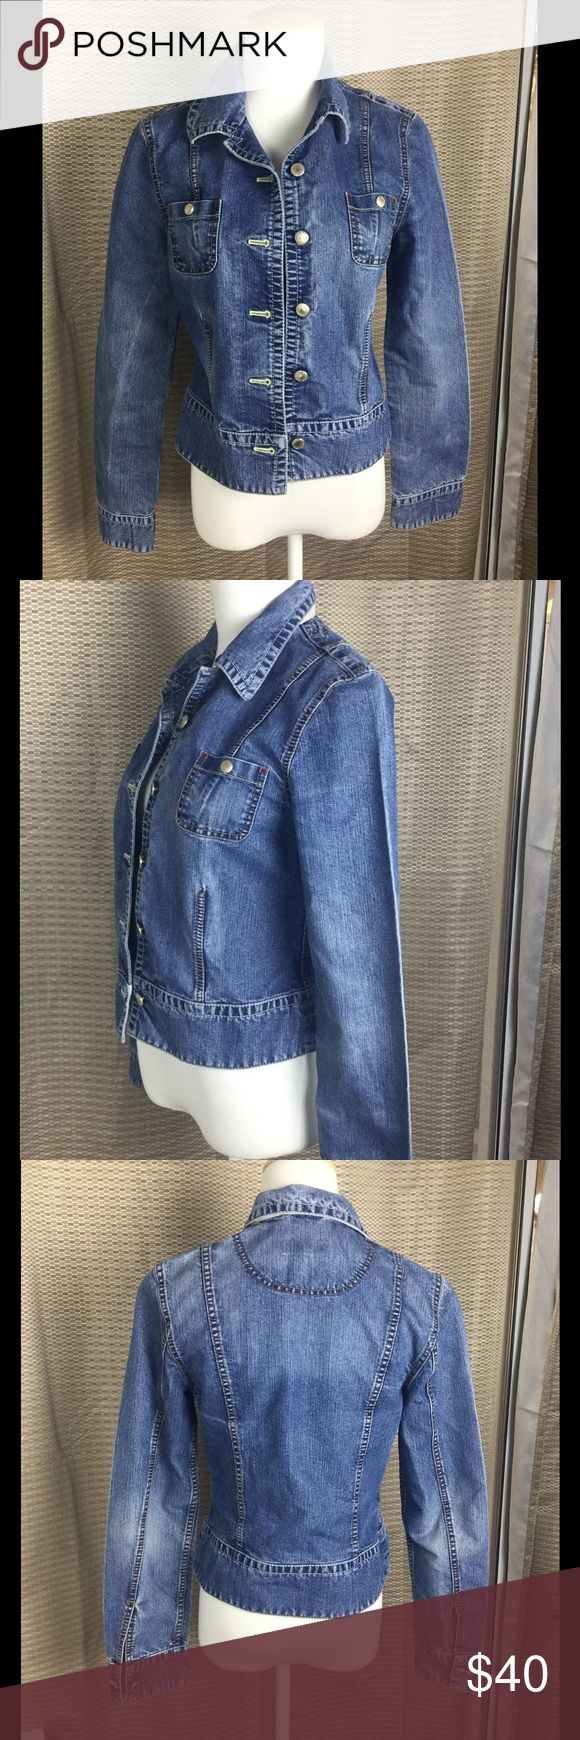 "🆕Listing. Escada Sport Designer Jacket.  Sz 36🌟 Love this Escada denim jacket.  Waist 17"". Waist 15"". Length 20"". In good condition.  Love love this jacket! Escada Jackets & Coats"